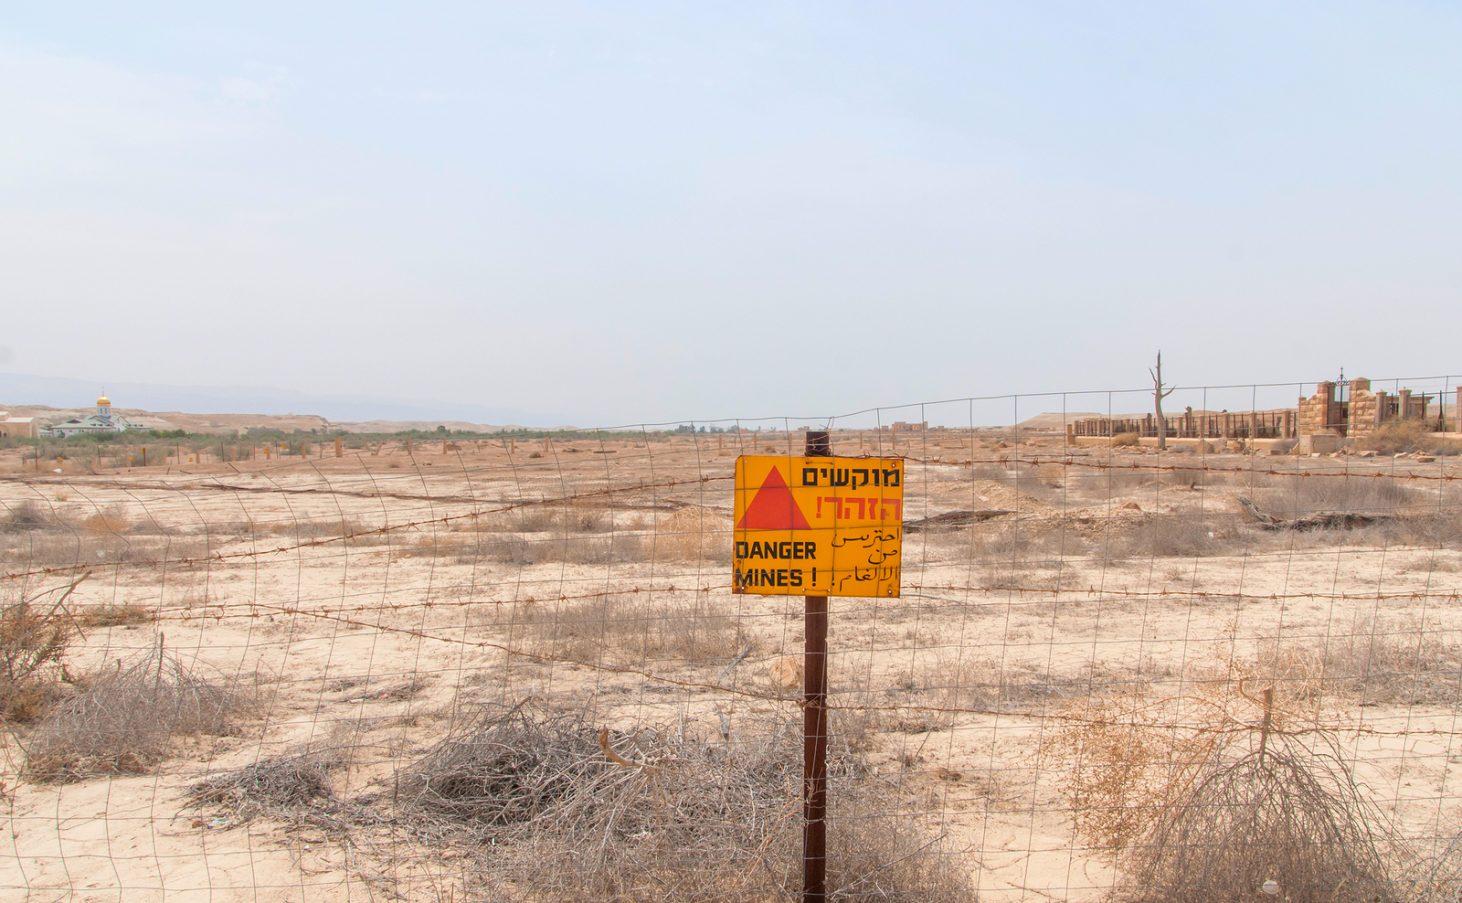 Minefield sign in Hebrew, Arabic, English in Jordan valley, Israel